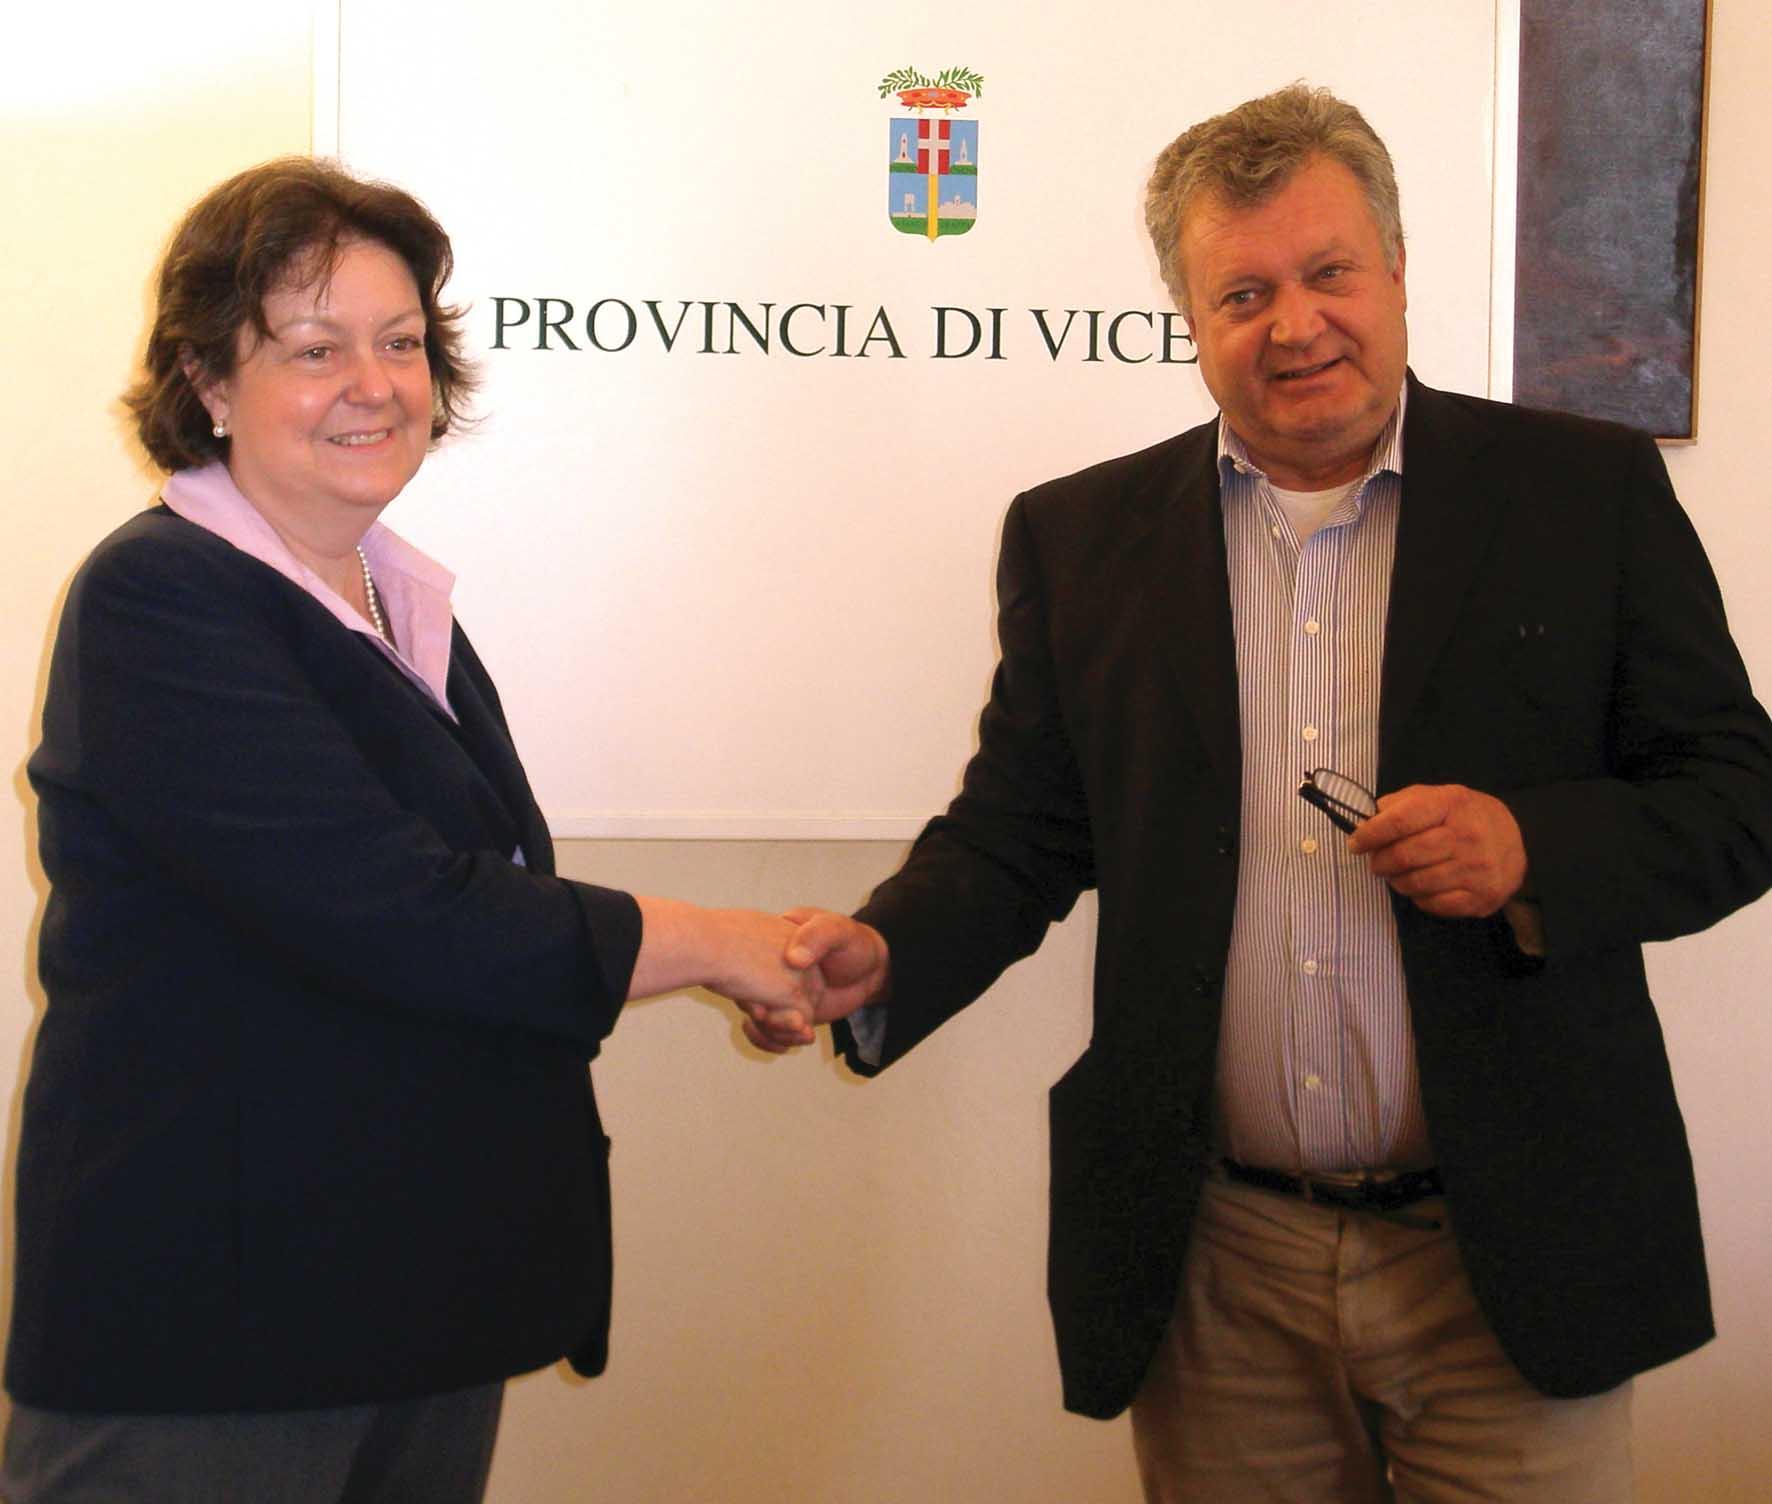 vicenza giunta commissaariale schneck galla 1